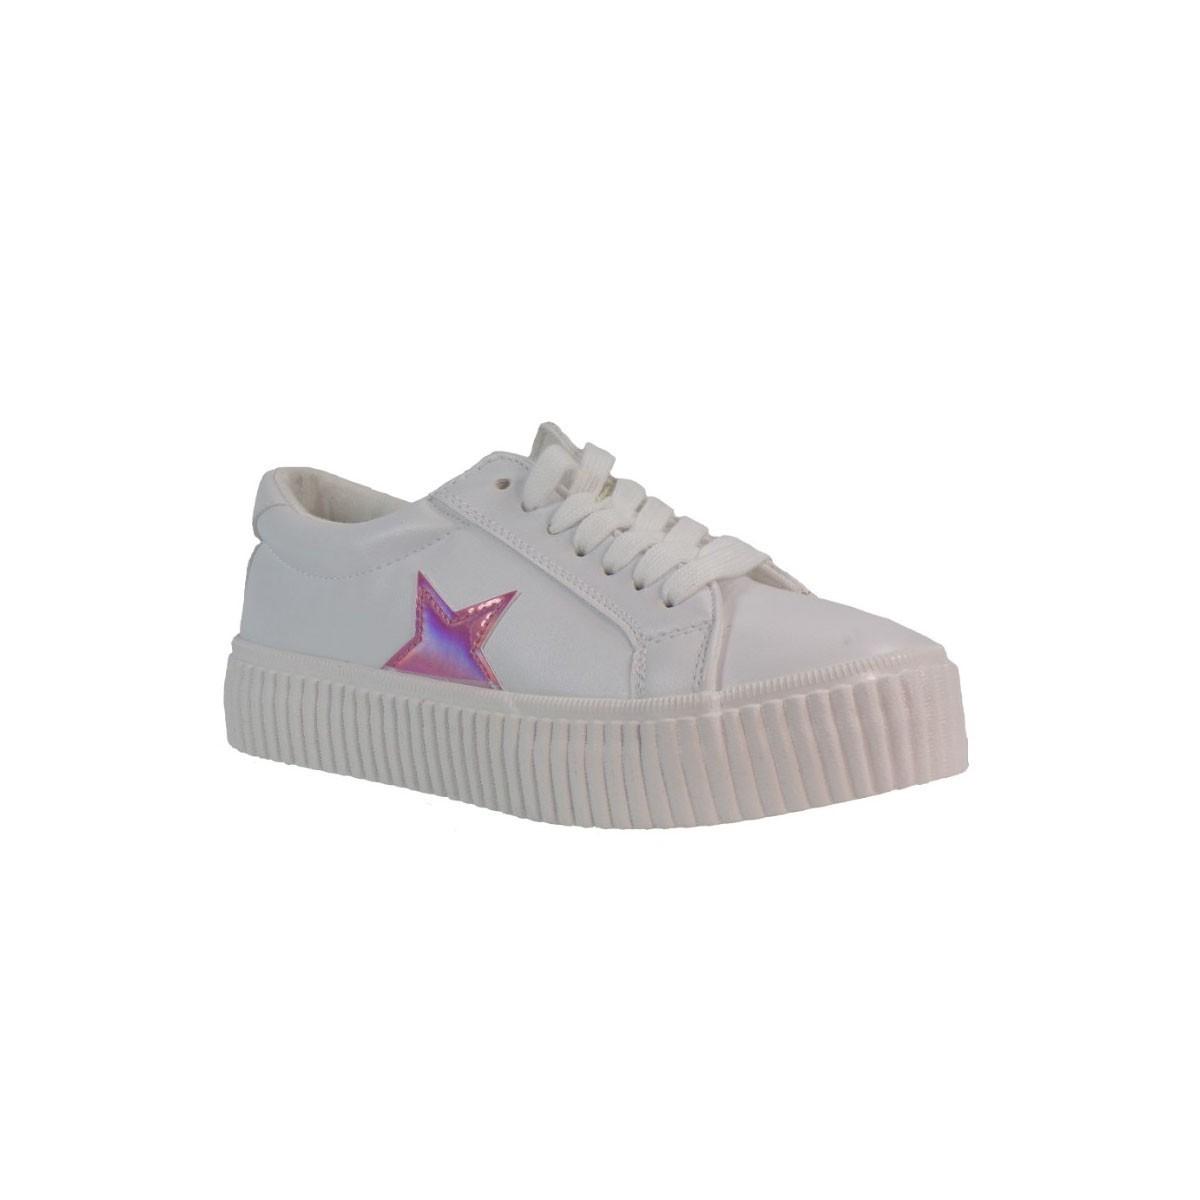 Coolway Sneakers Γυναικεία Παπούτσια CHERRY 137 Λευκό Coolway Cherry 137 Λ